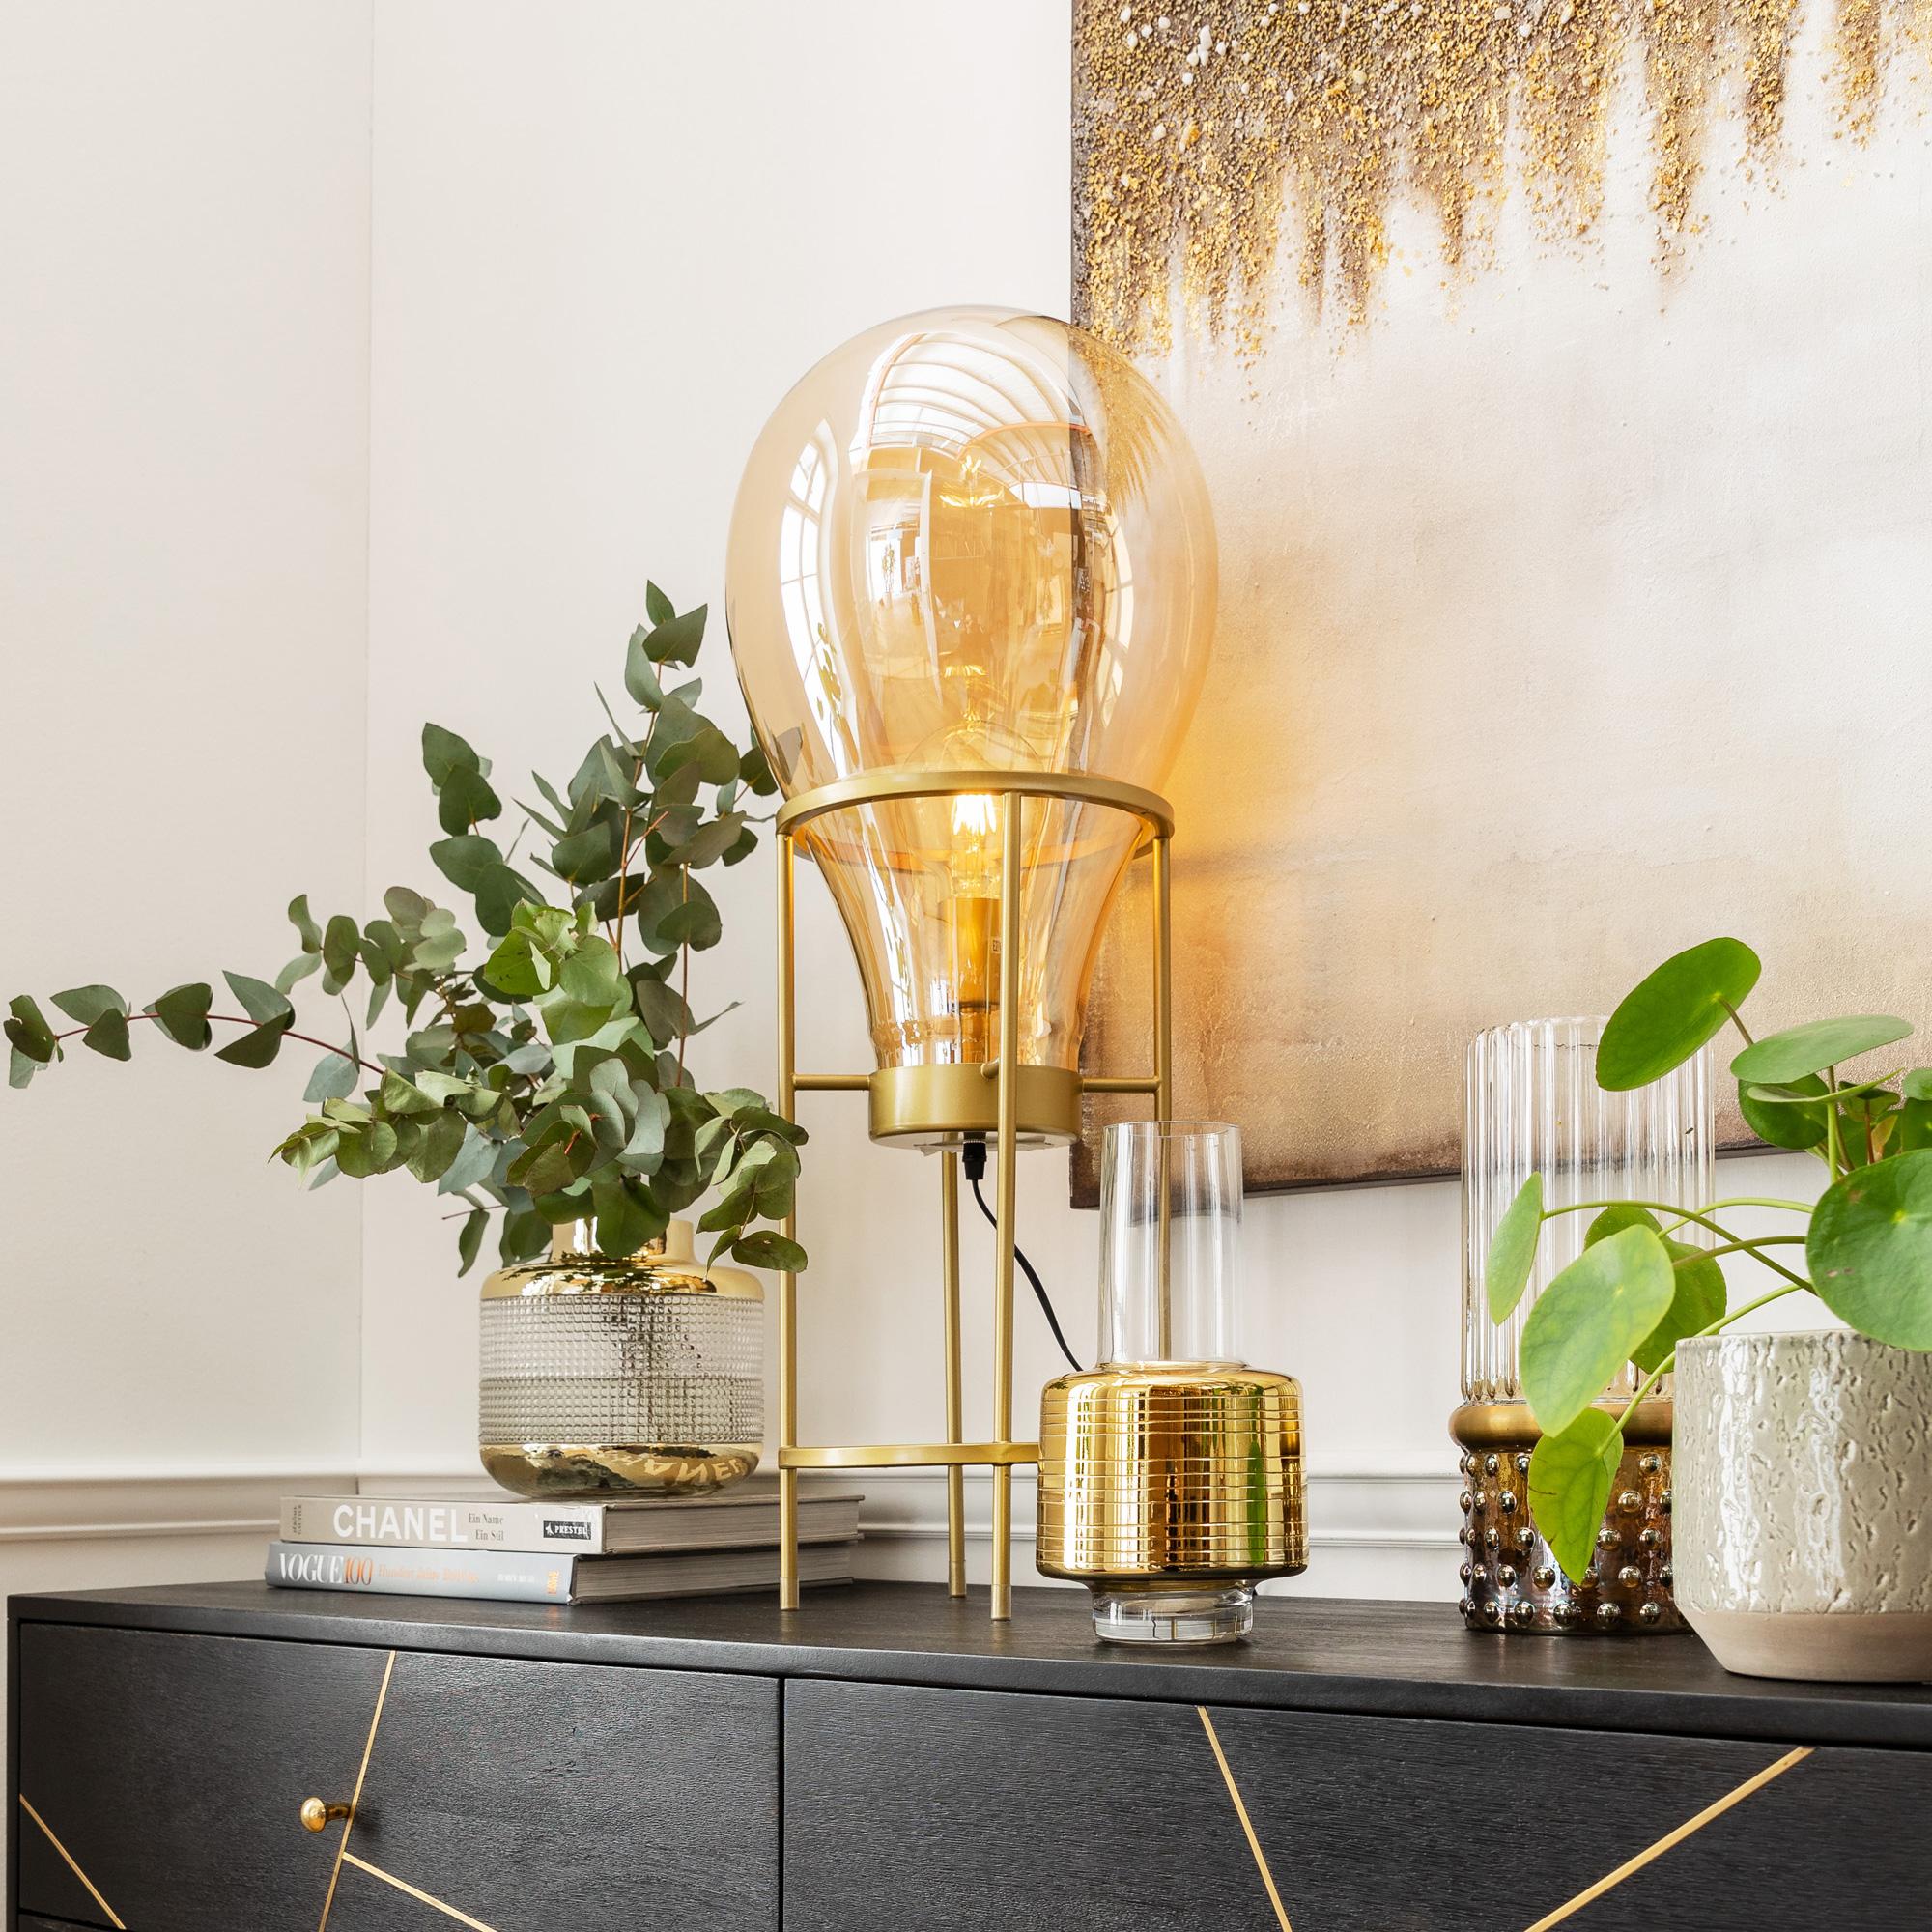 Kare Design Pear Frame Table Lamp 51323 Reuter